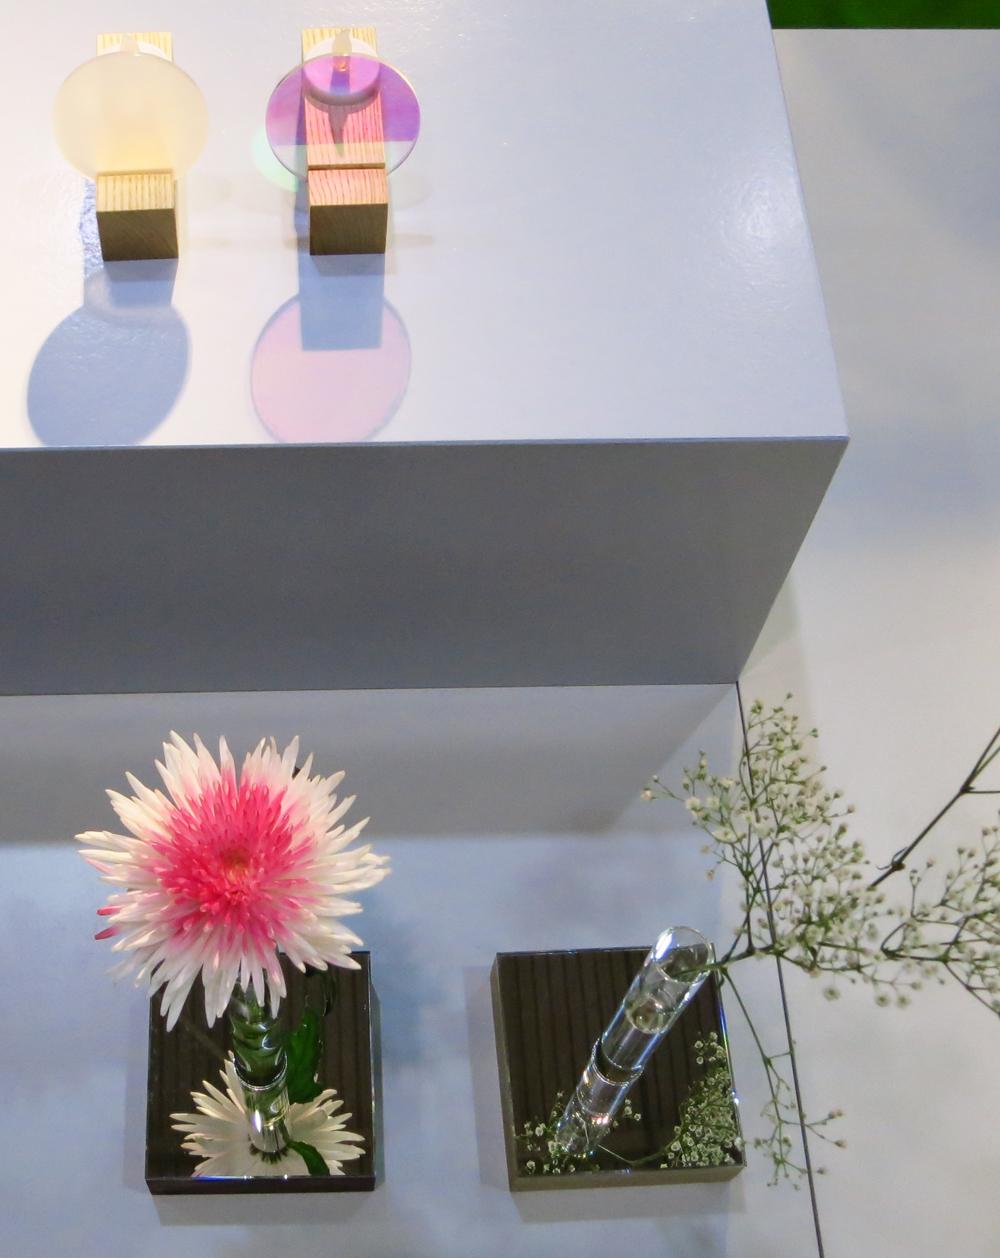 Blickfang-Hamburg-2014-Studio_Thier&vanDaalen1